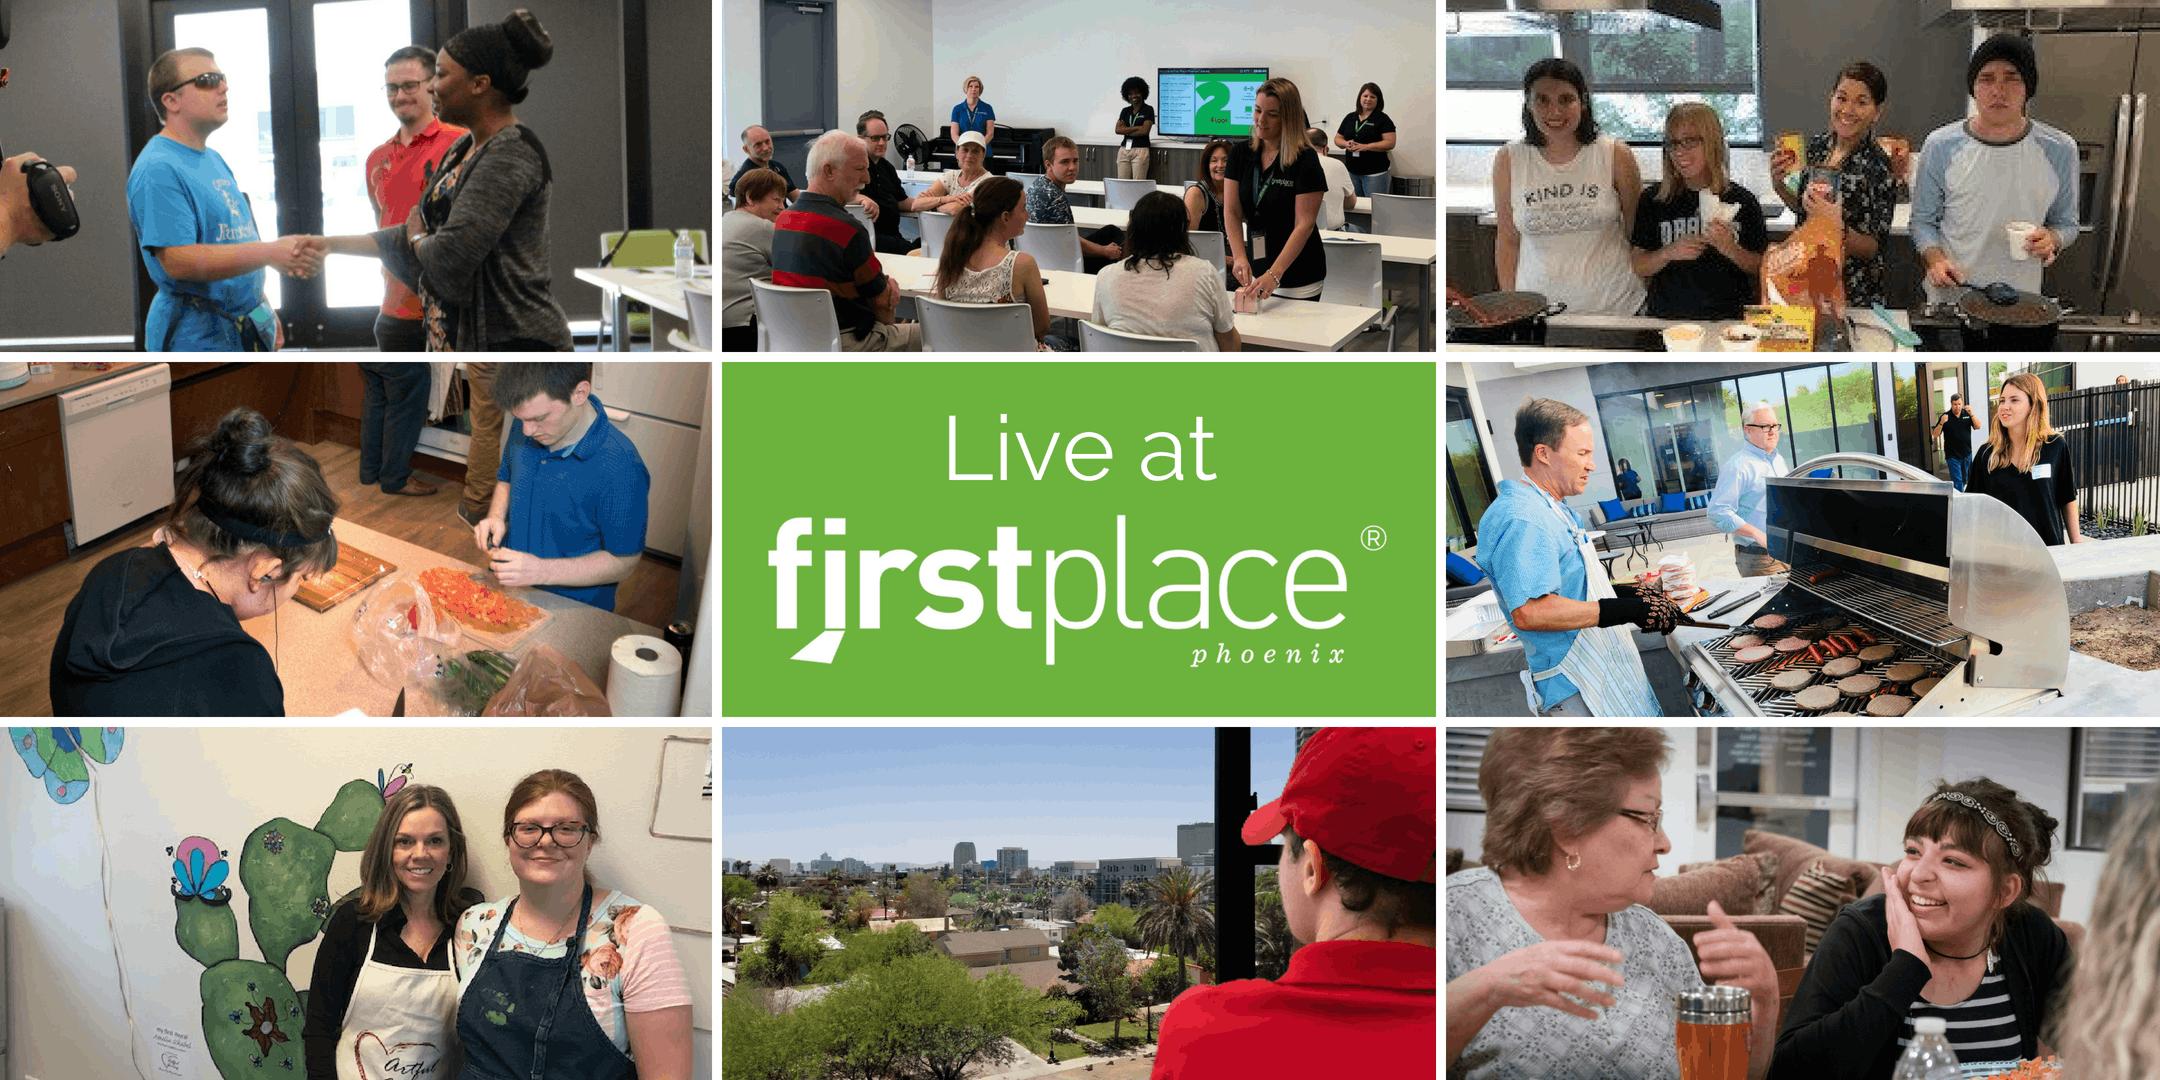 Explore First Place–Phoenix - August 1